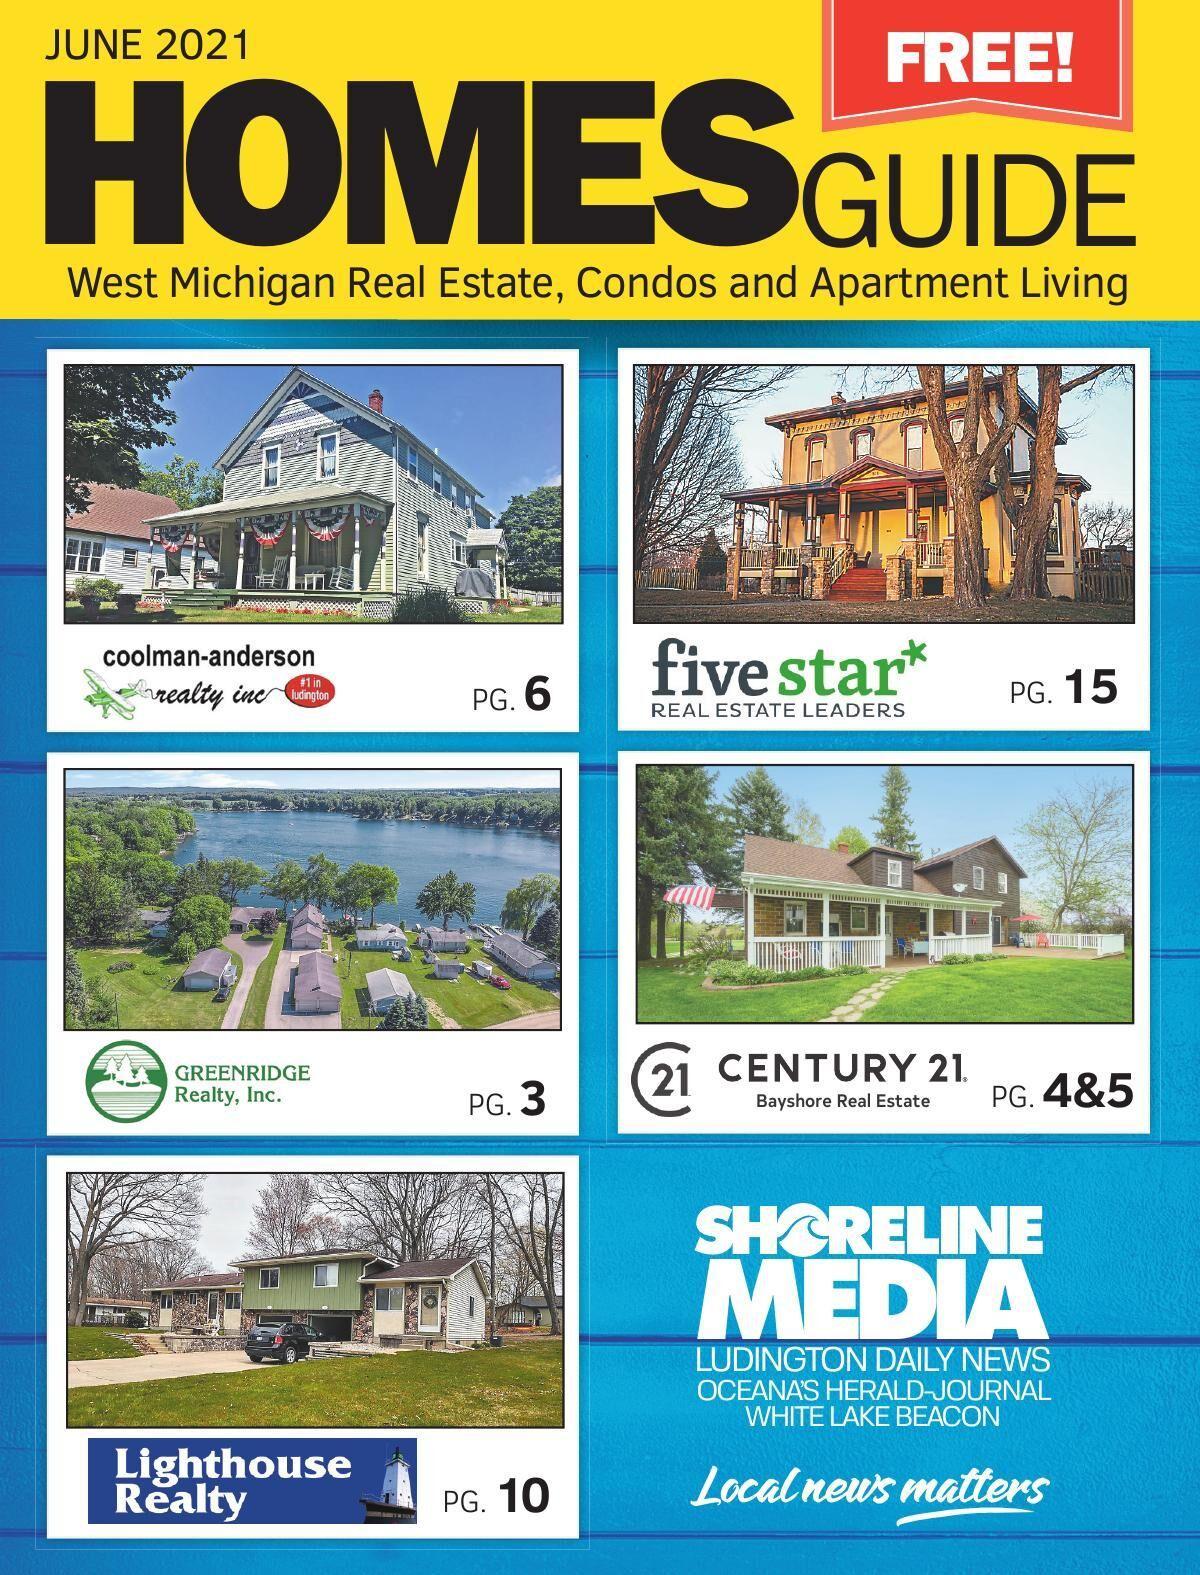 Homes Guide - June 2021